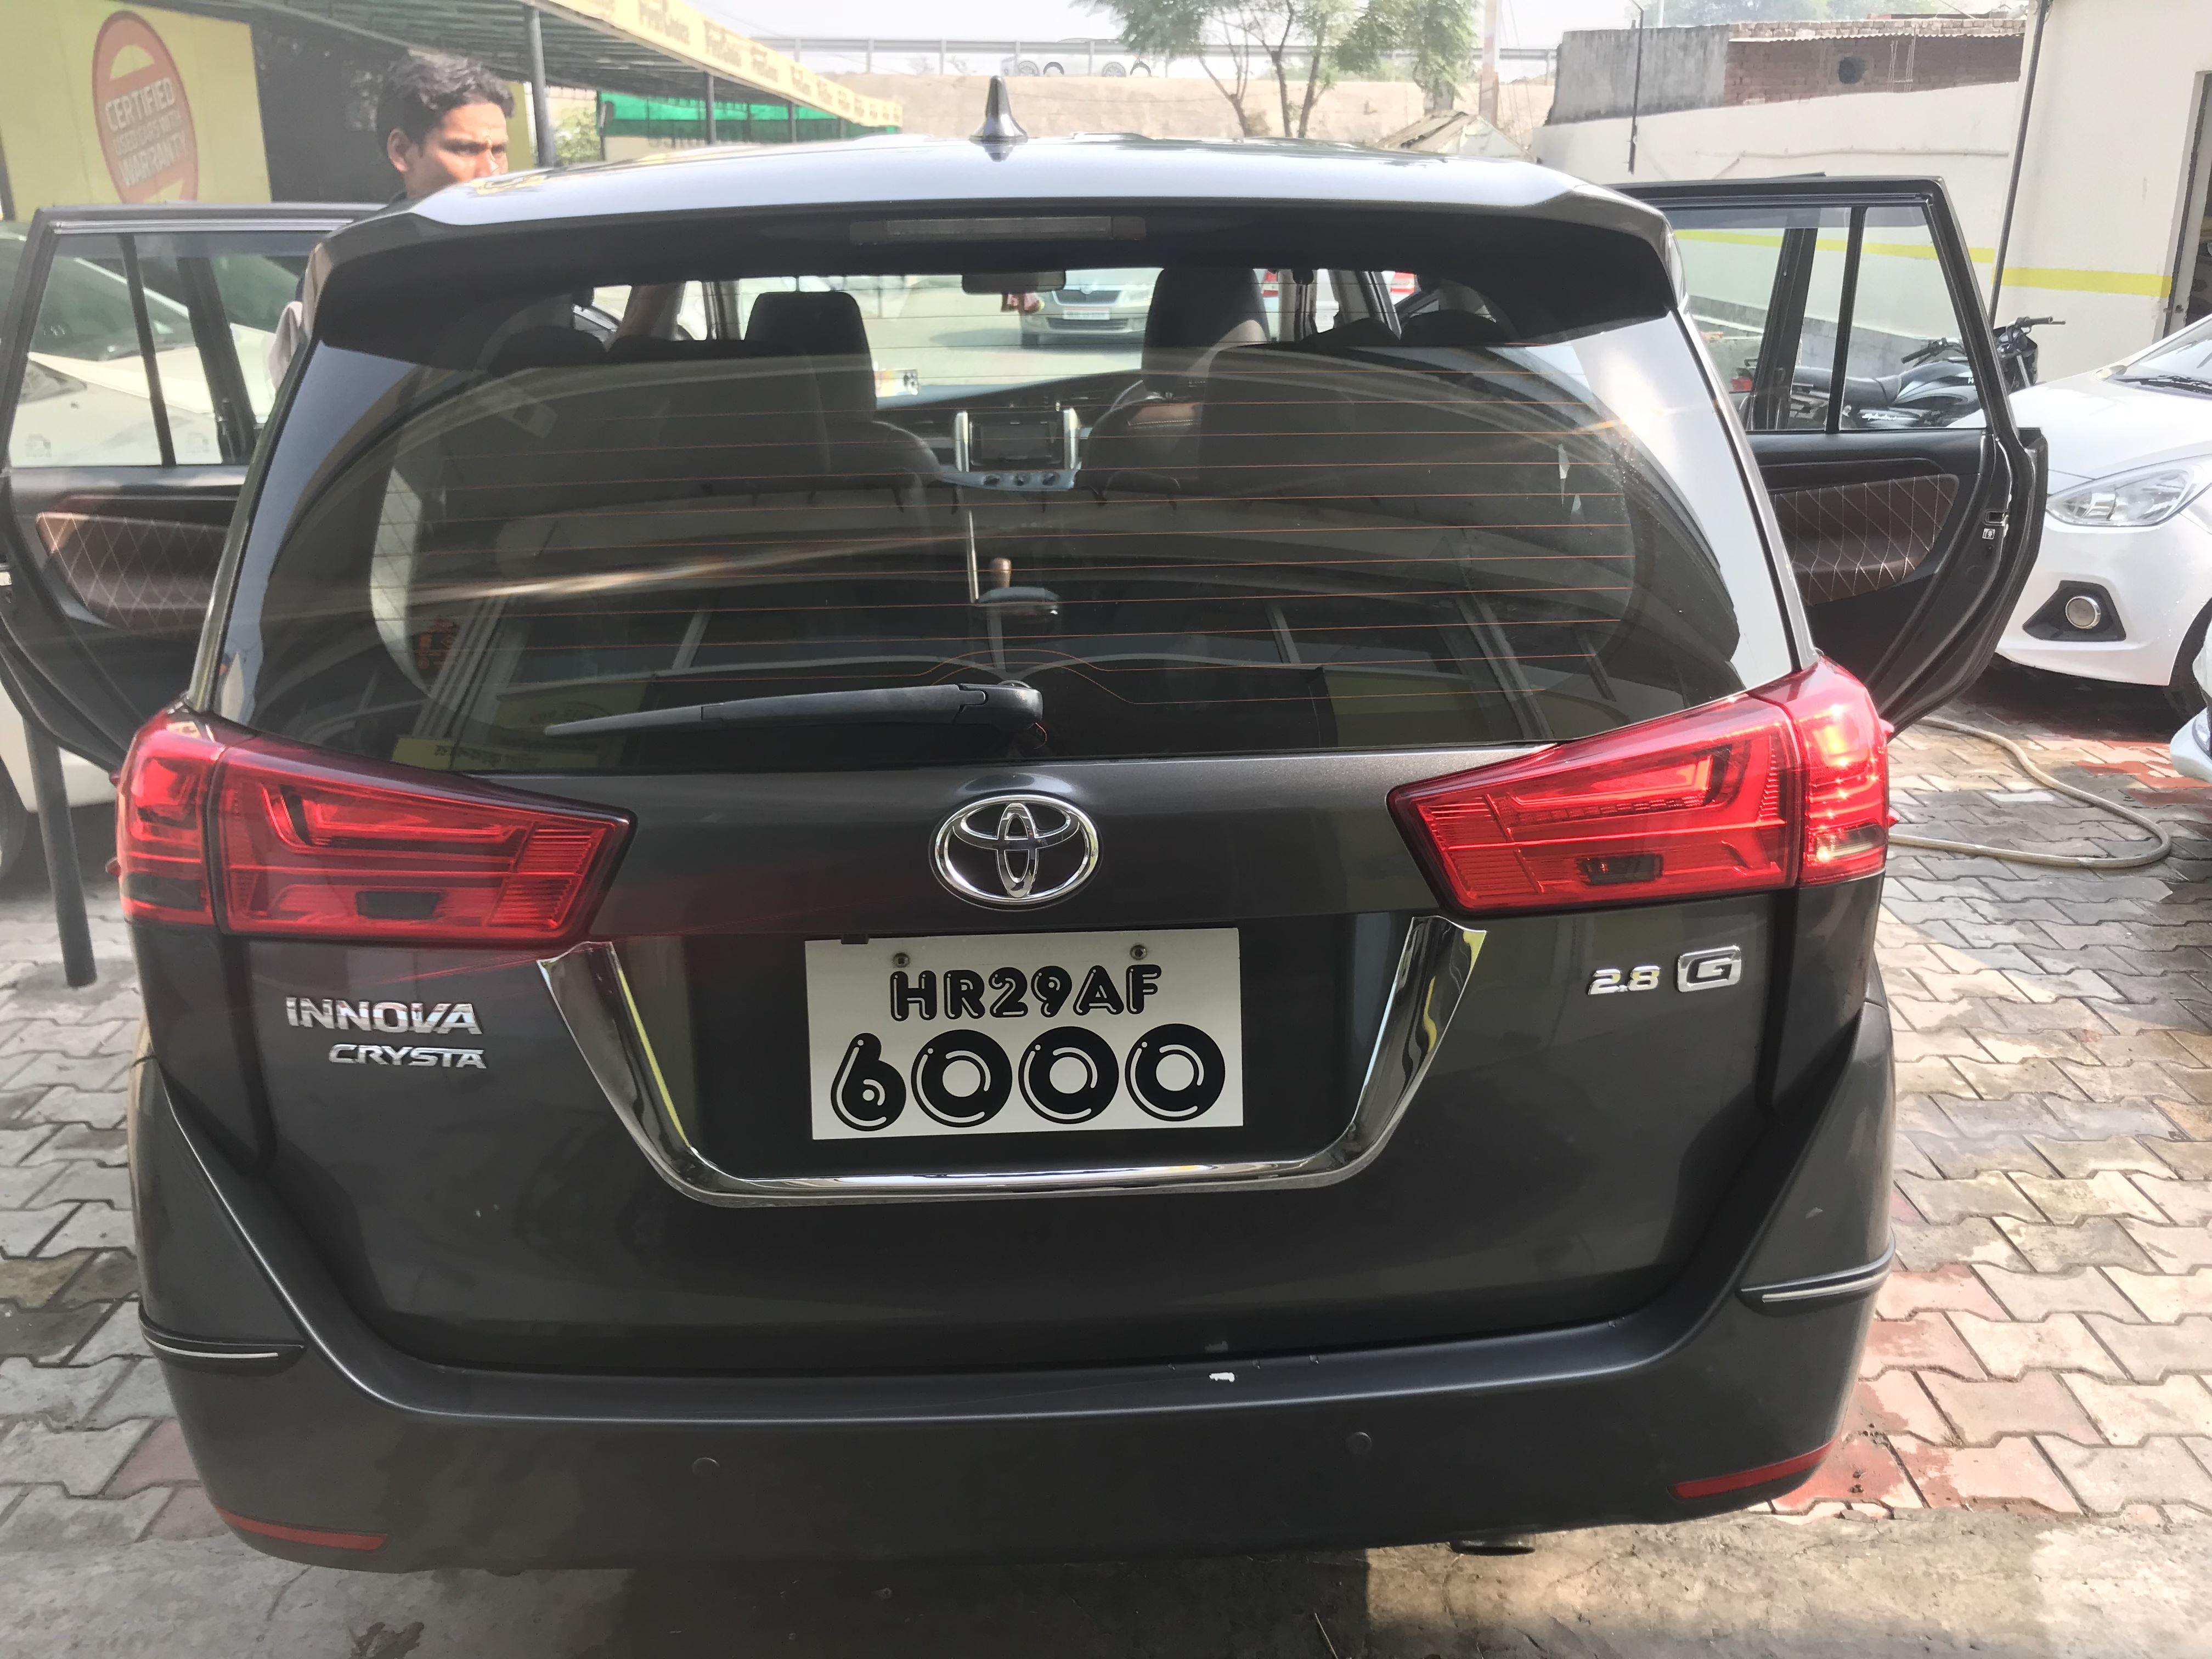 2017 Used Toyota Innova Crysta 2.8 GX AT 7 STR